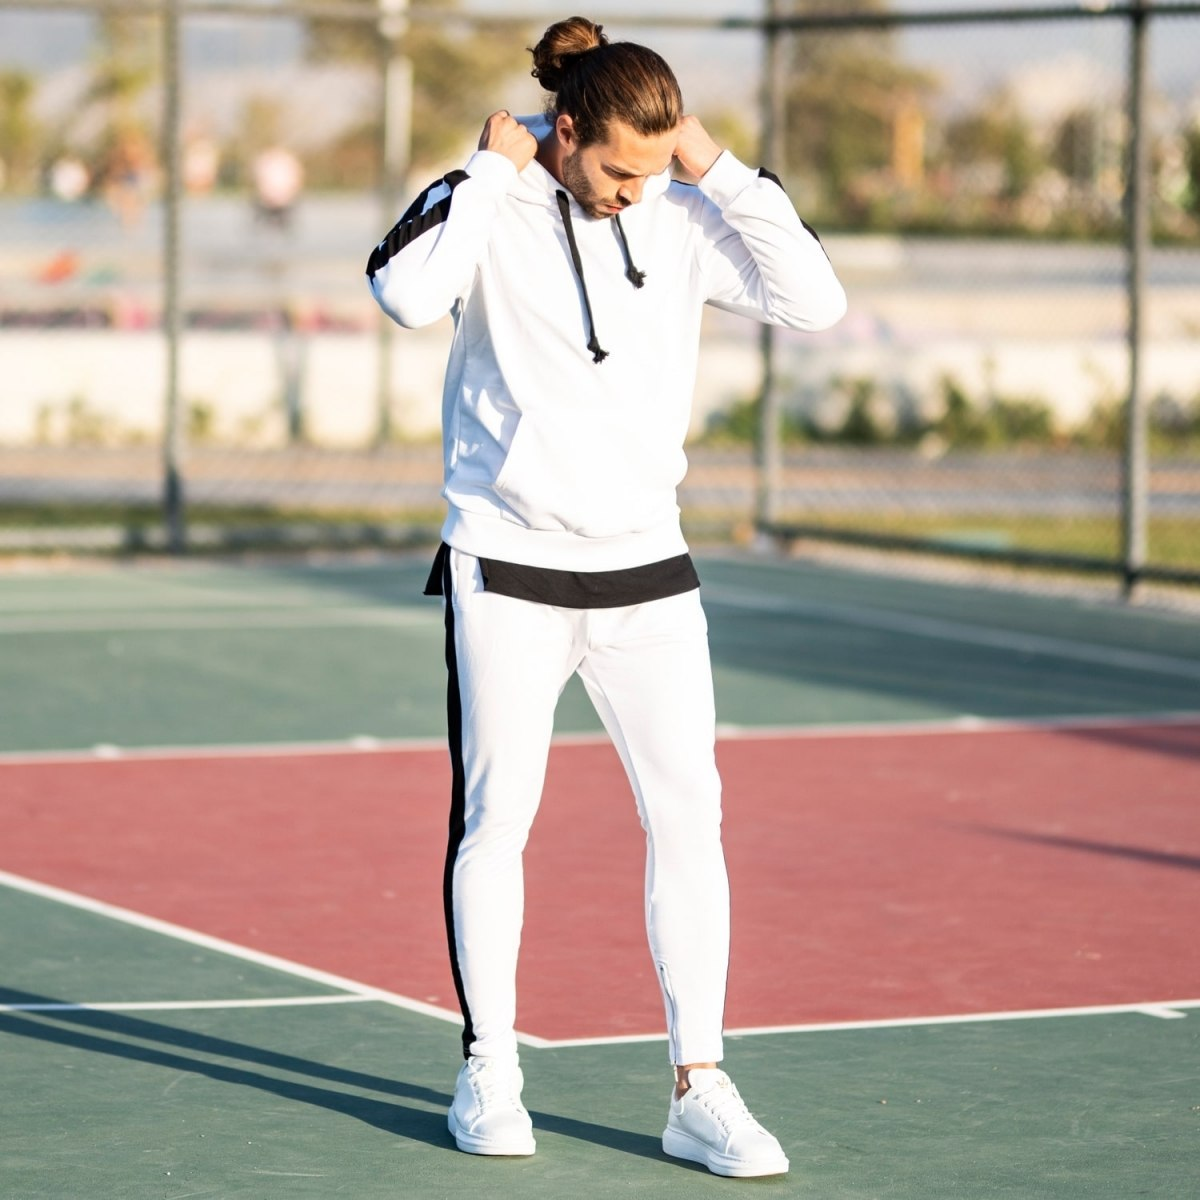 Men's Black-Stripped White Tracksuit Mv Premium Brand - 1